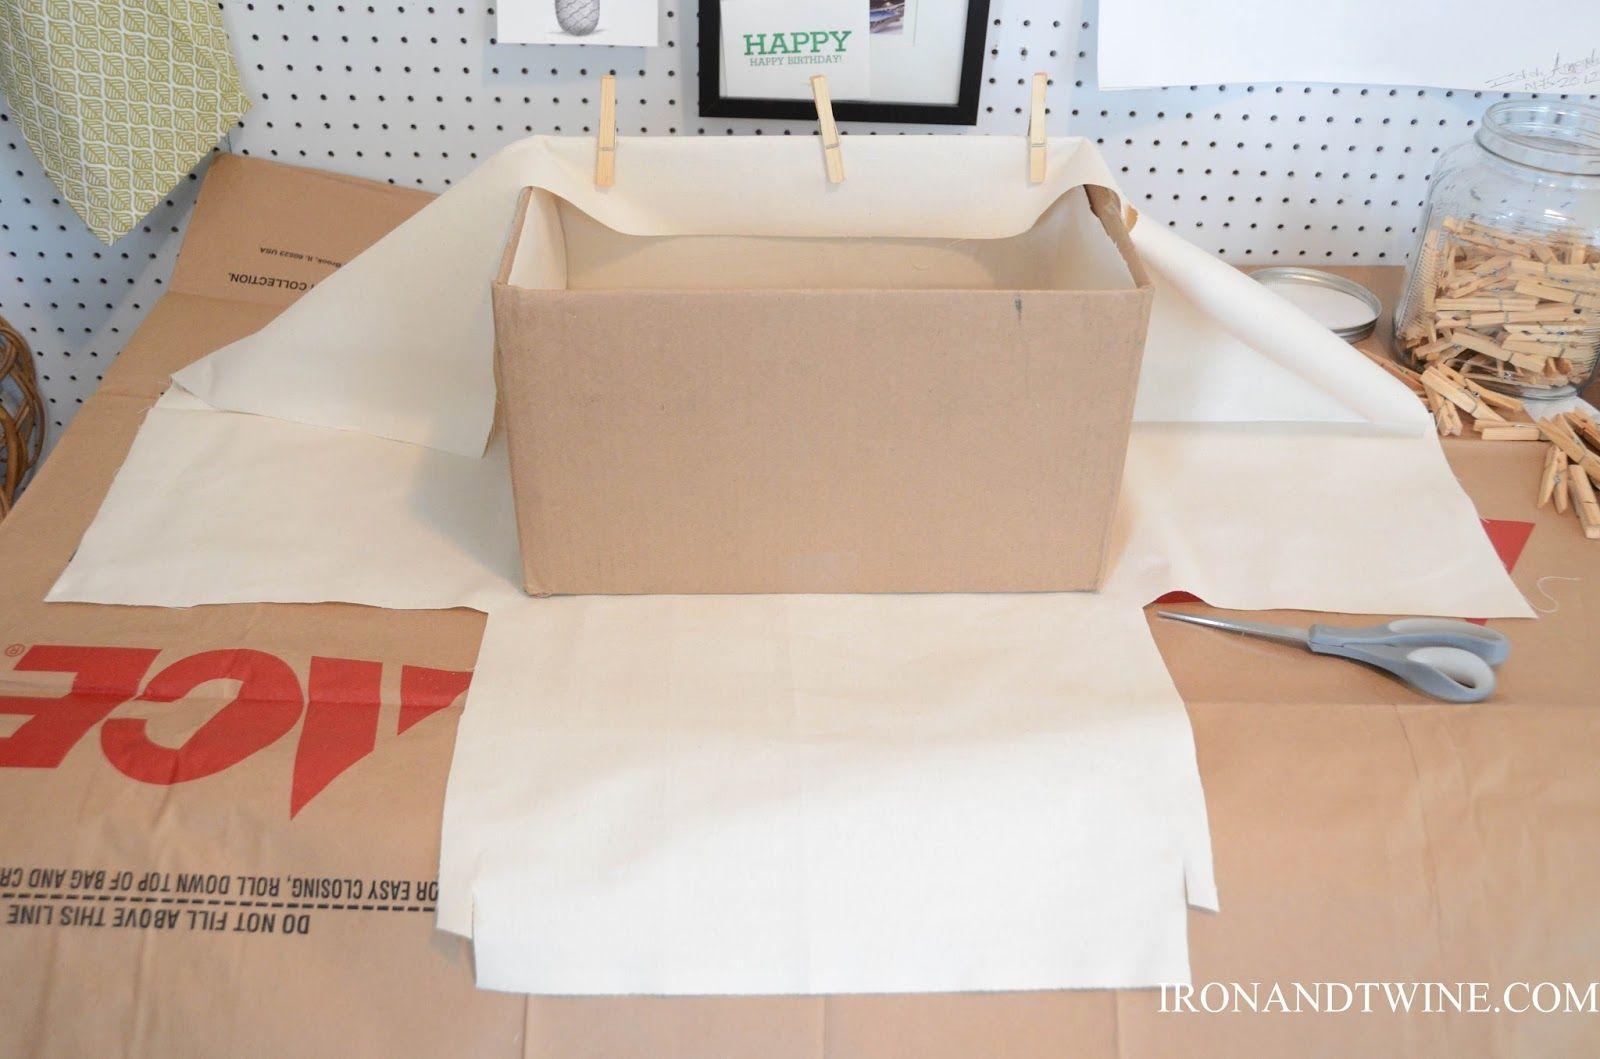 IRON & TWINE: DIY Belt Strap Bins